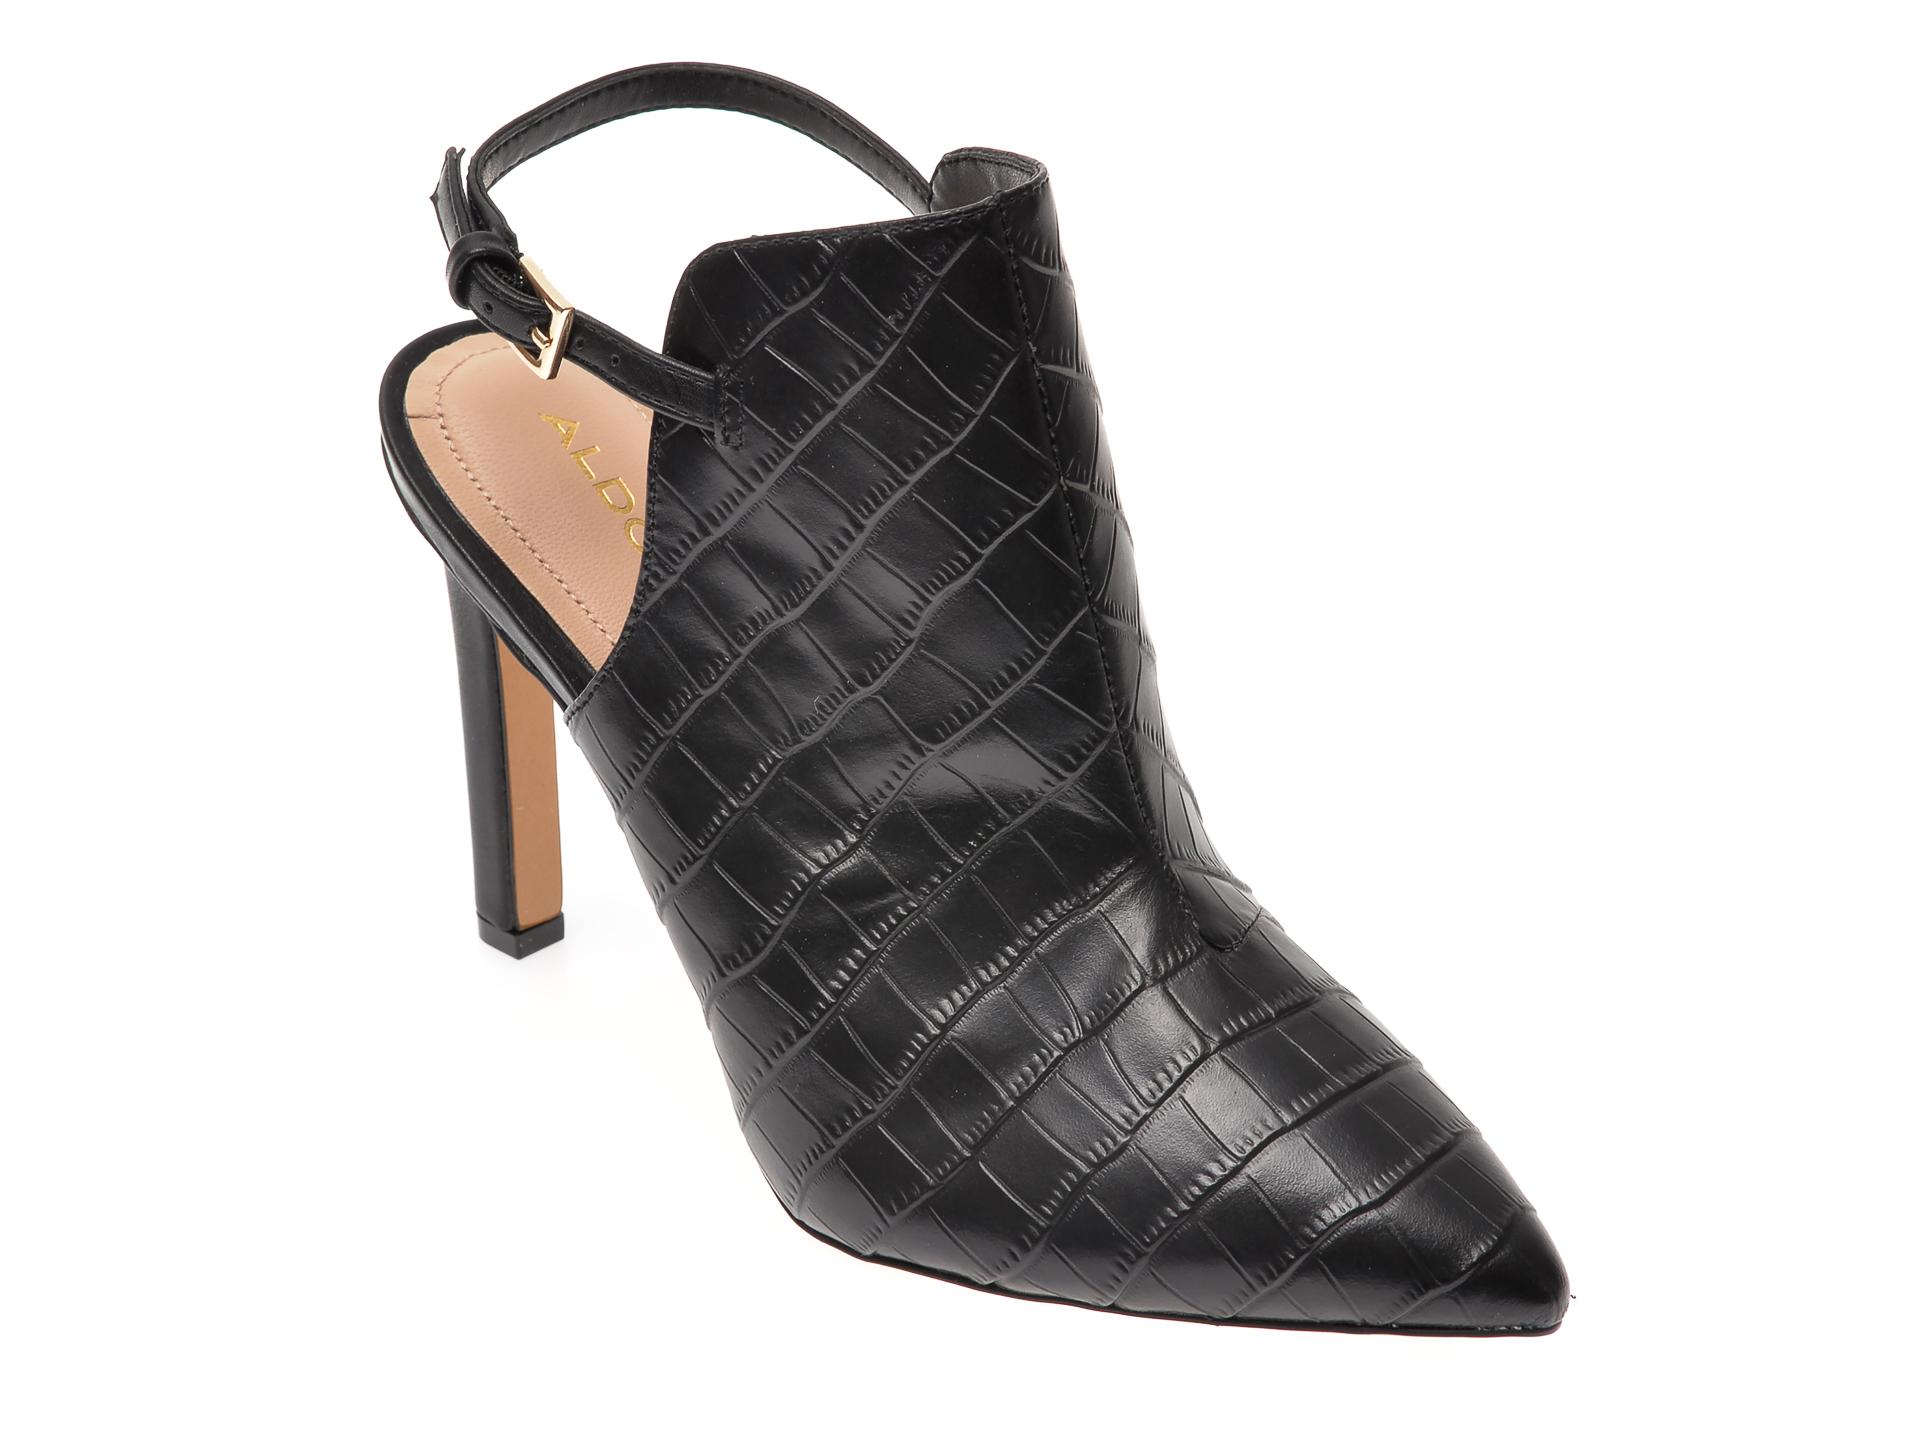 Pantofi ALDO negri, Firleigh007, din piele naturala